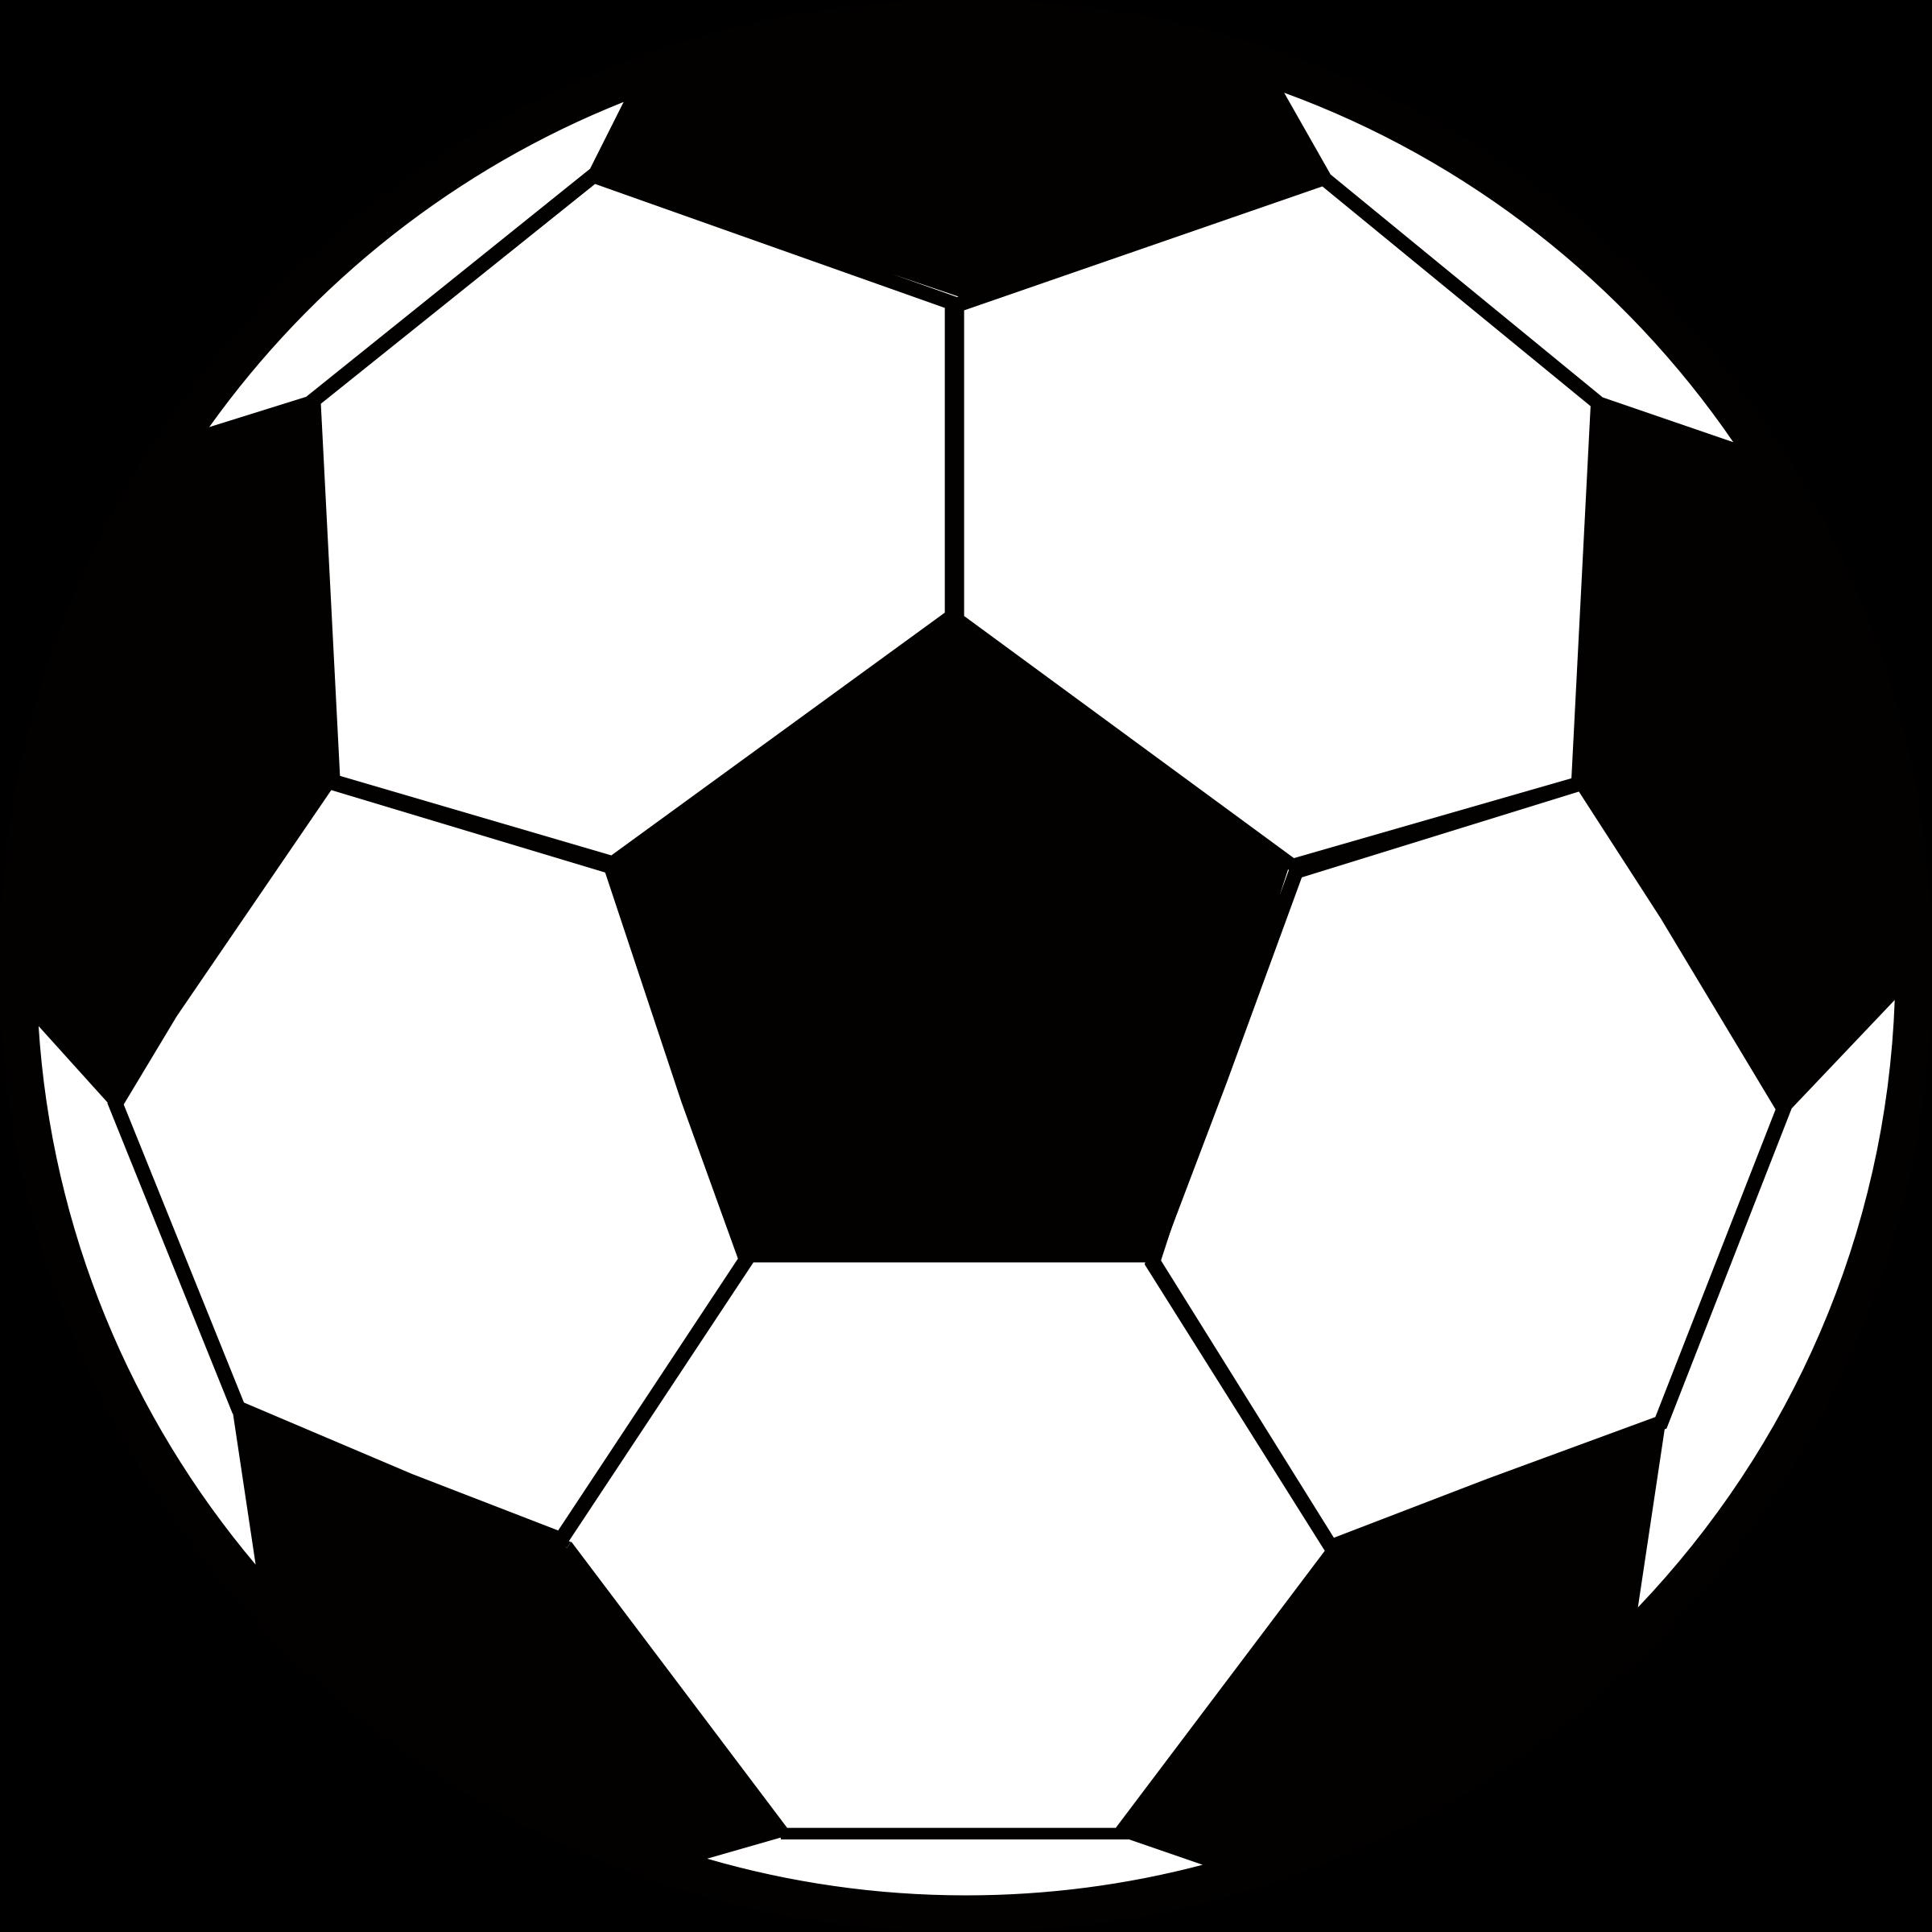 HD Soccer Ball Clipart Outline.